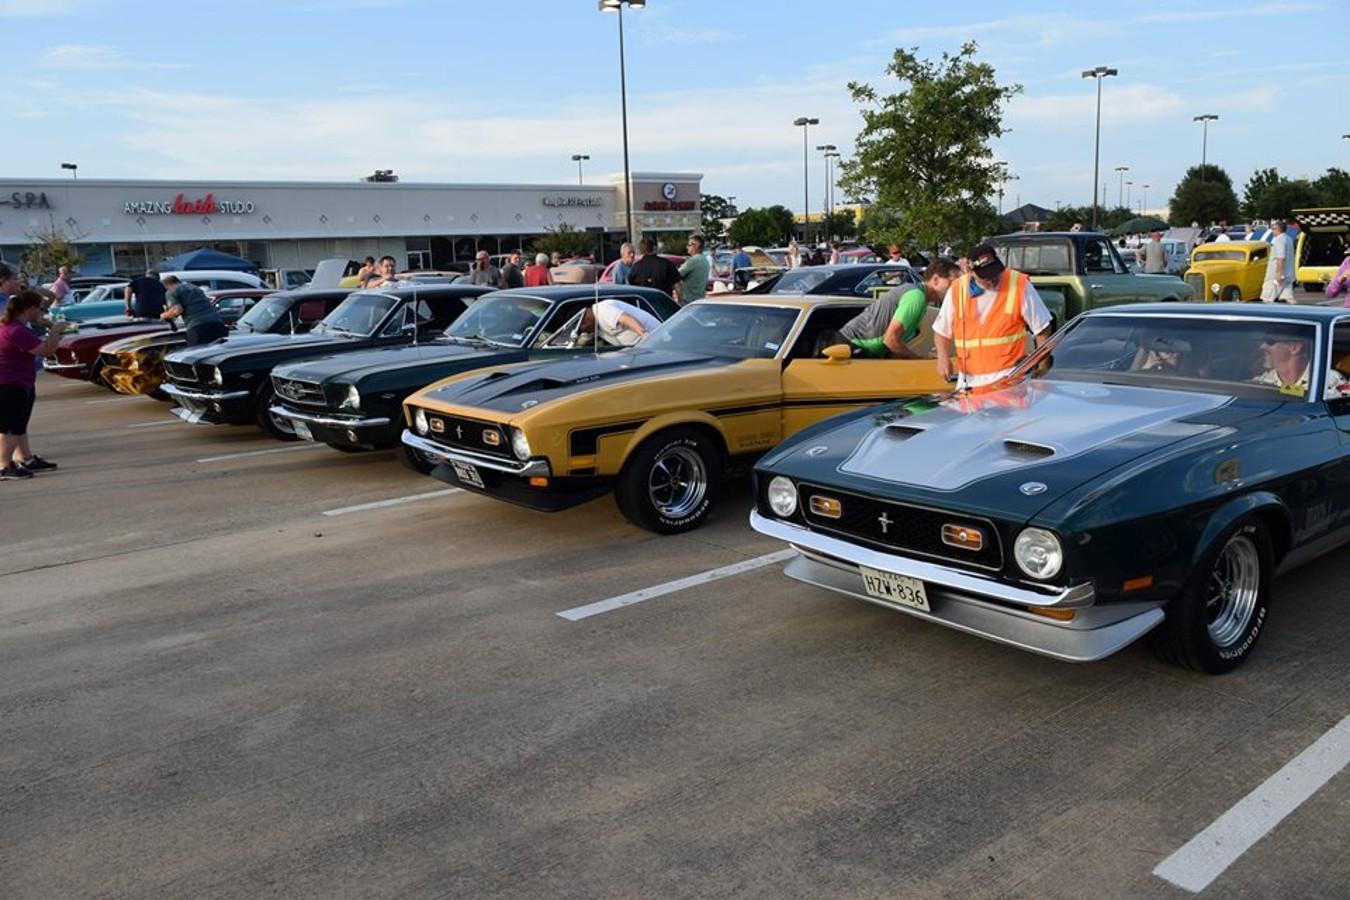 Heidi's customs & classics: Niftee 50ees Car Show lineup includes quality custom, classic cars